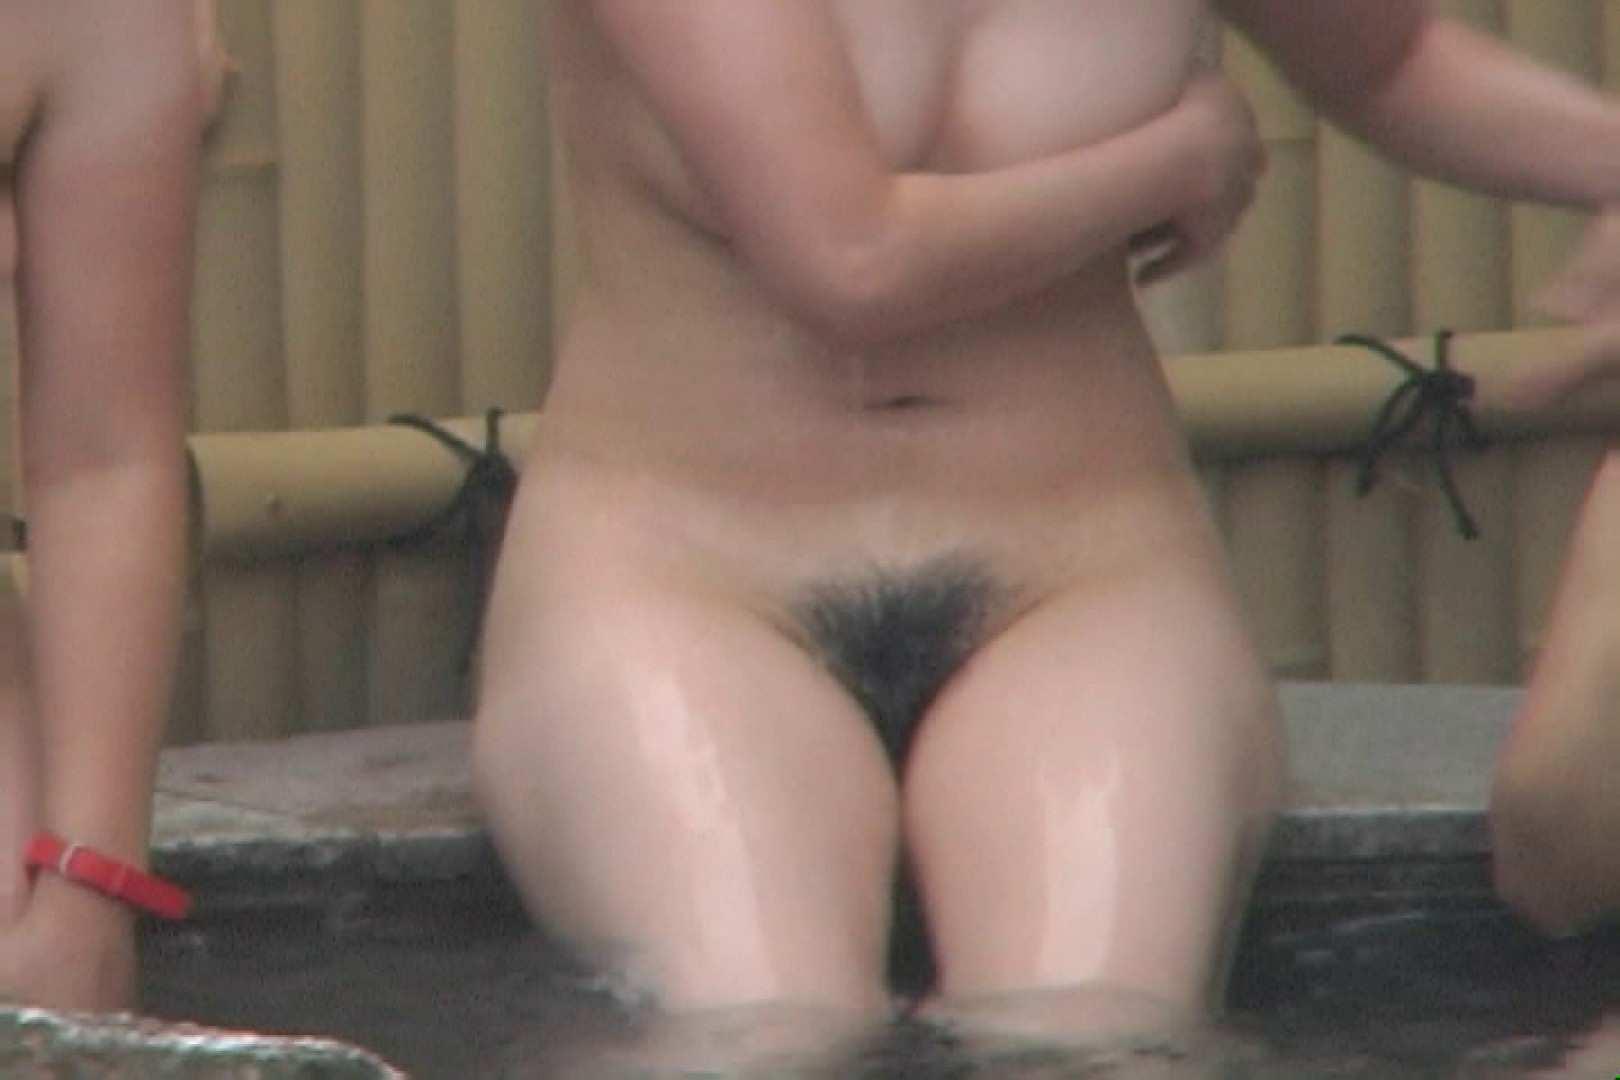 Aquaな露天風呂Vol.43【VIP限定】 盗撮師作品  74pic 57